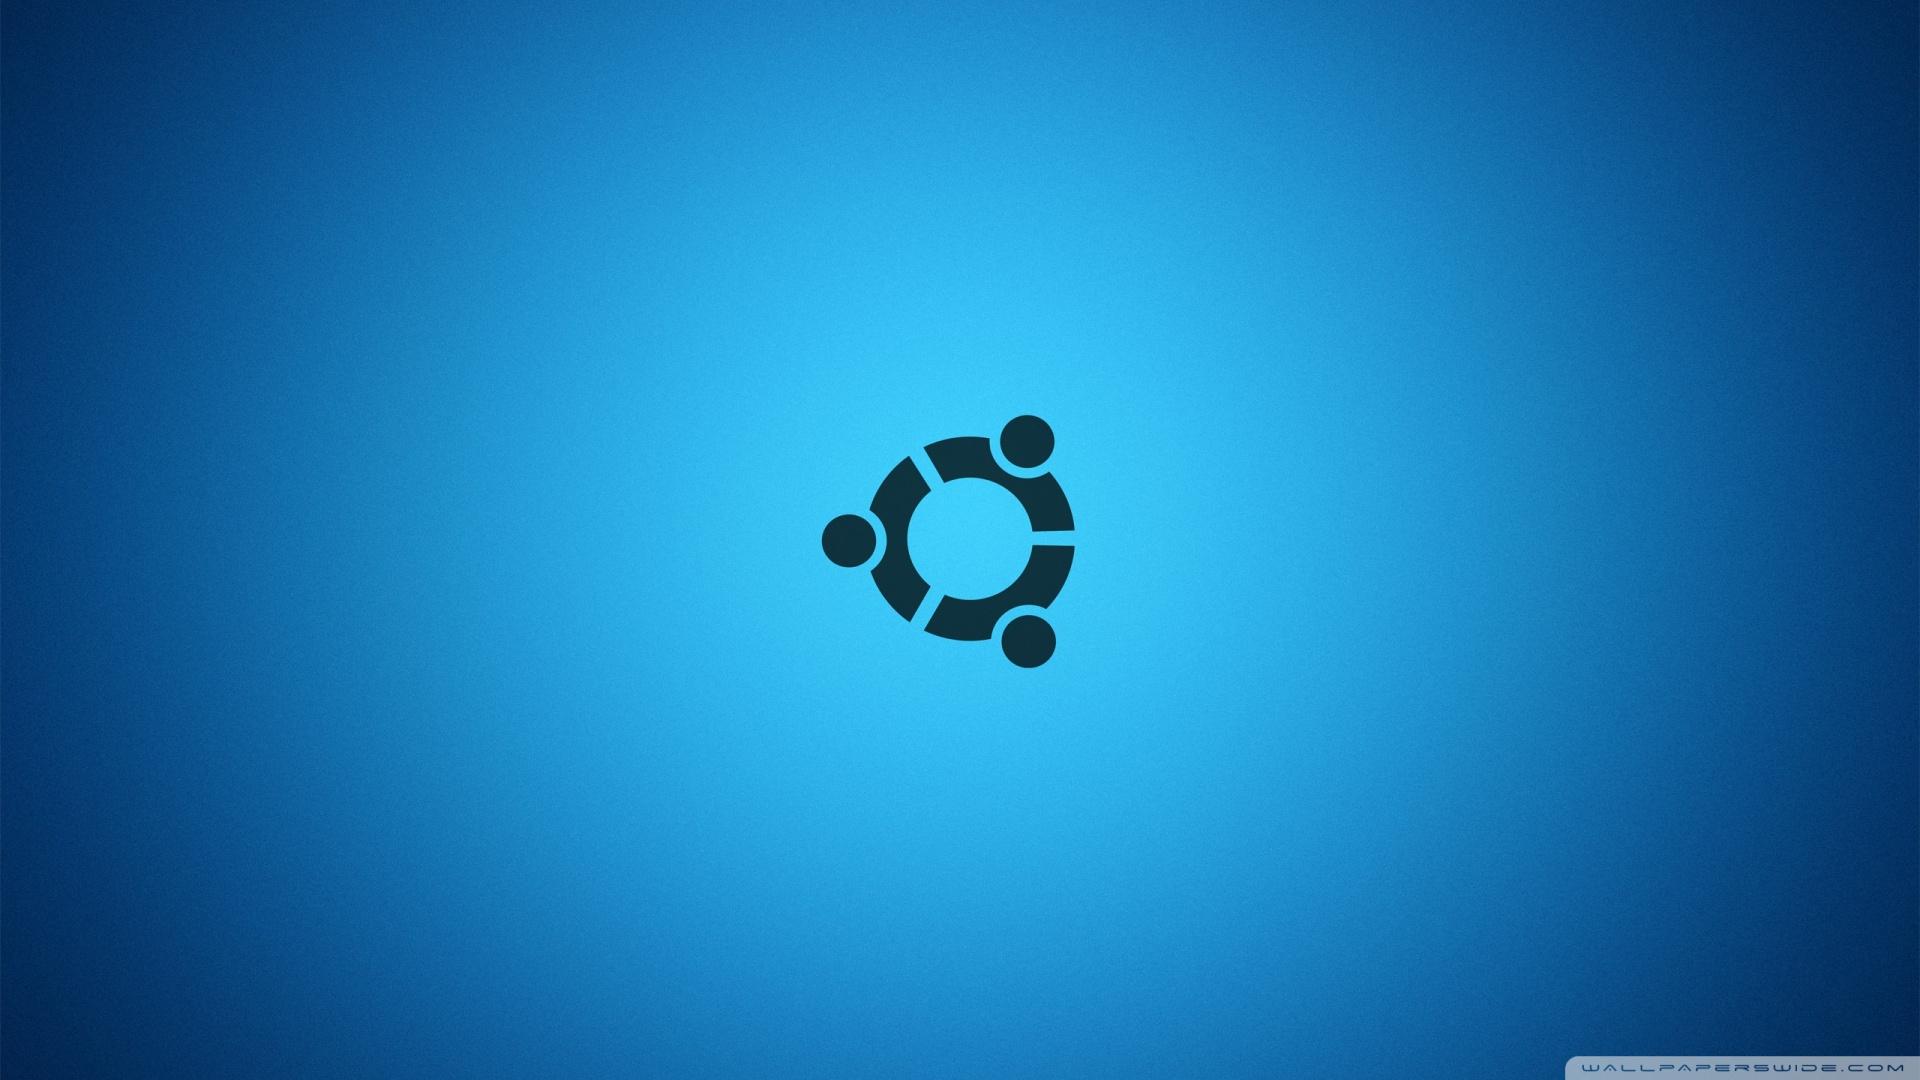 Ubuntu Desktop Blue Wallpaper 1920x1080 Ubuntu Desktop Blue 1920x1080